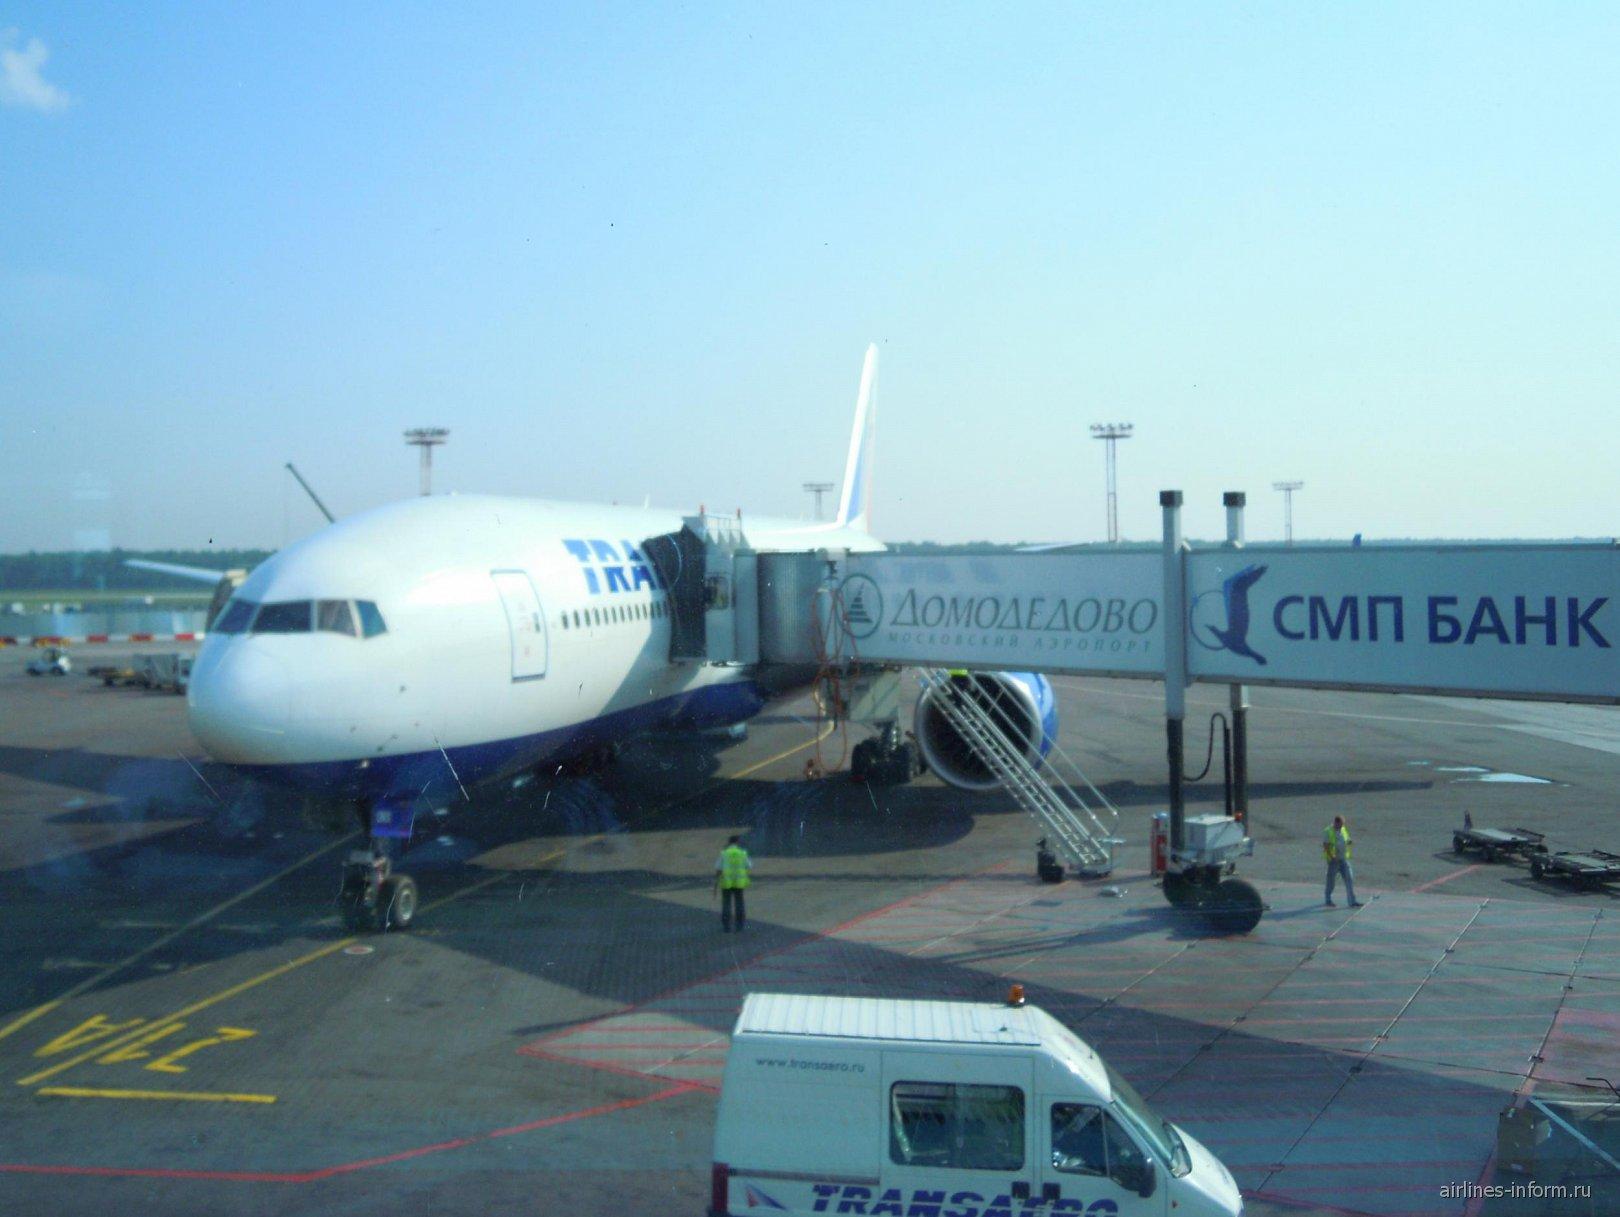 Боинг-777-200 авиакомпании Трансаэро в аэропорту Домодедово